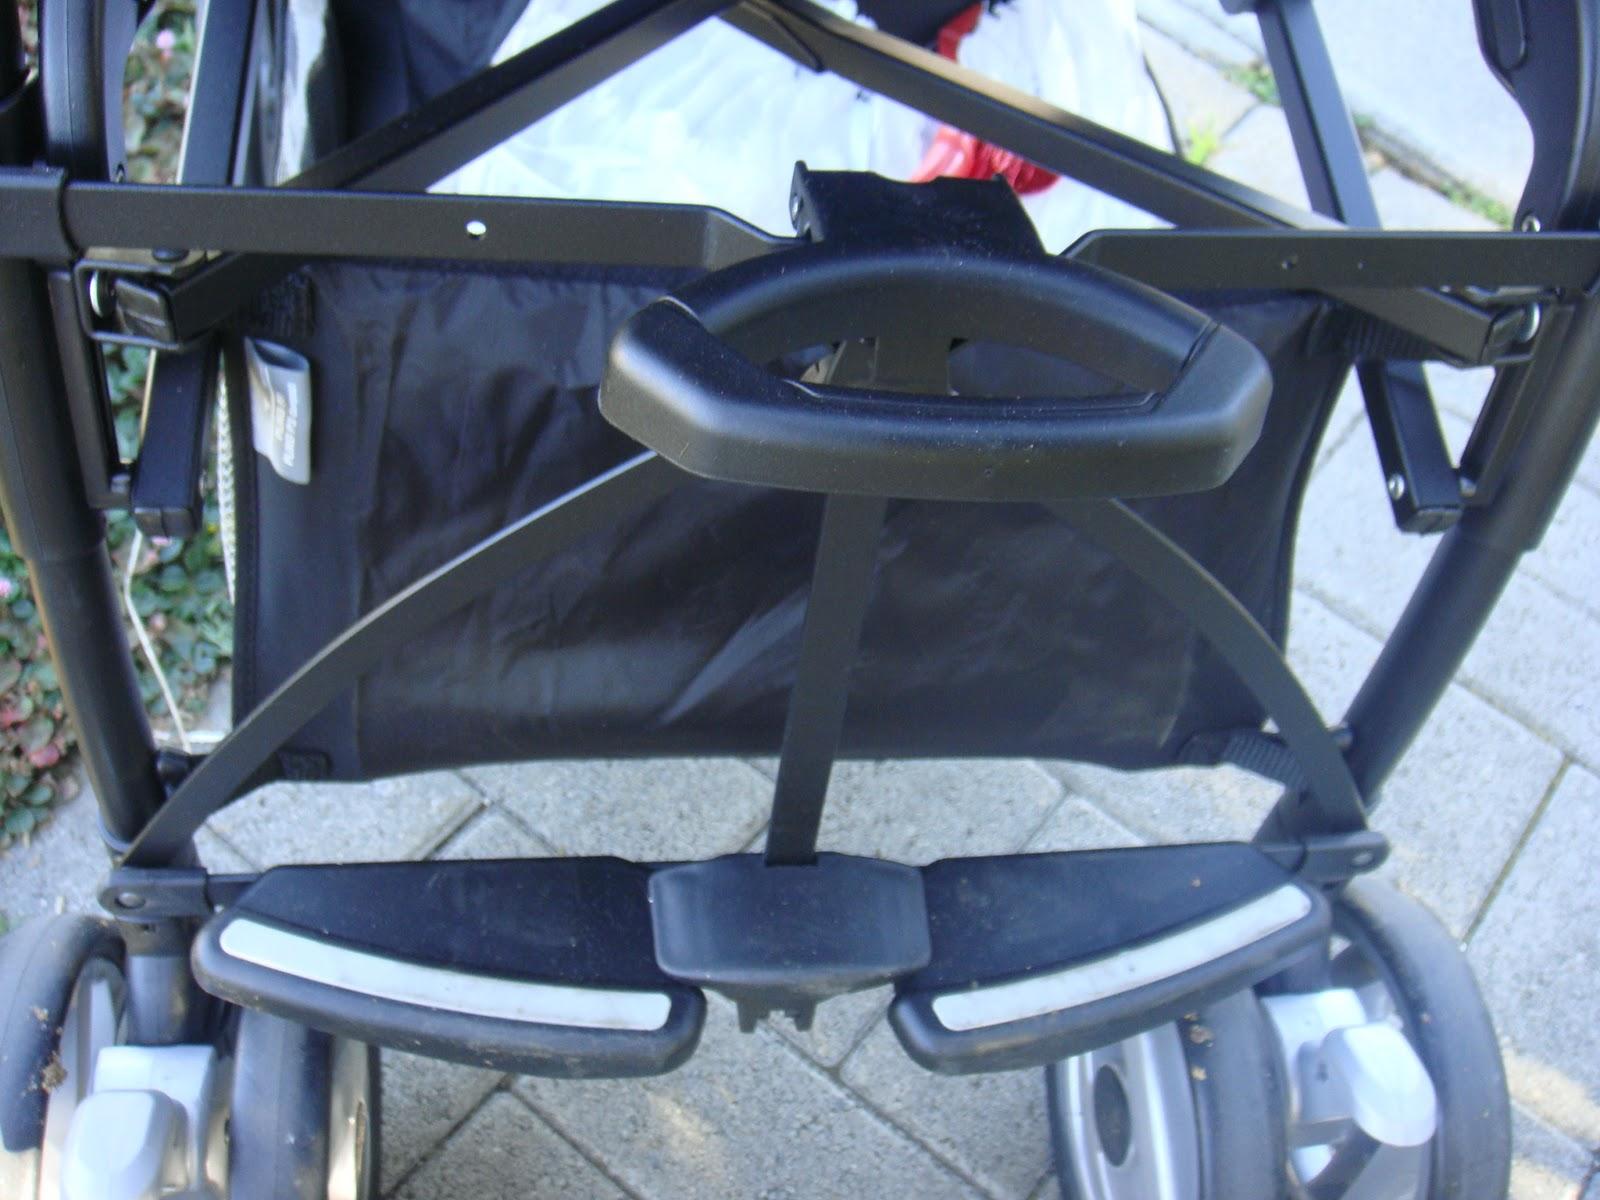 Black Friday Peg-Perego Pliko Switch Compact Stroller, Java (2012 Deals)